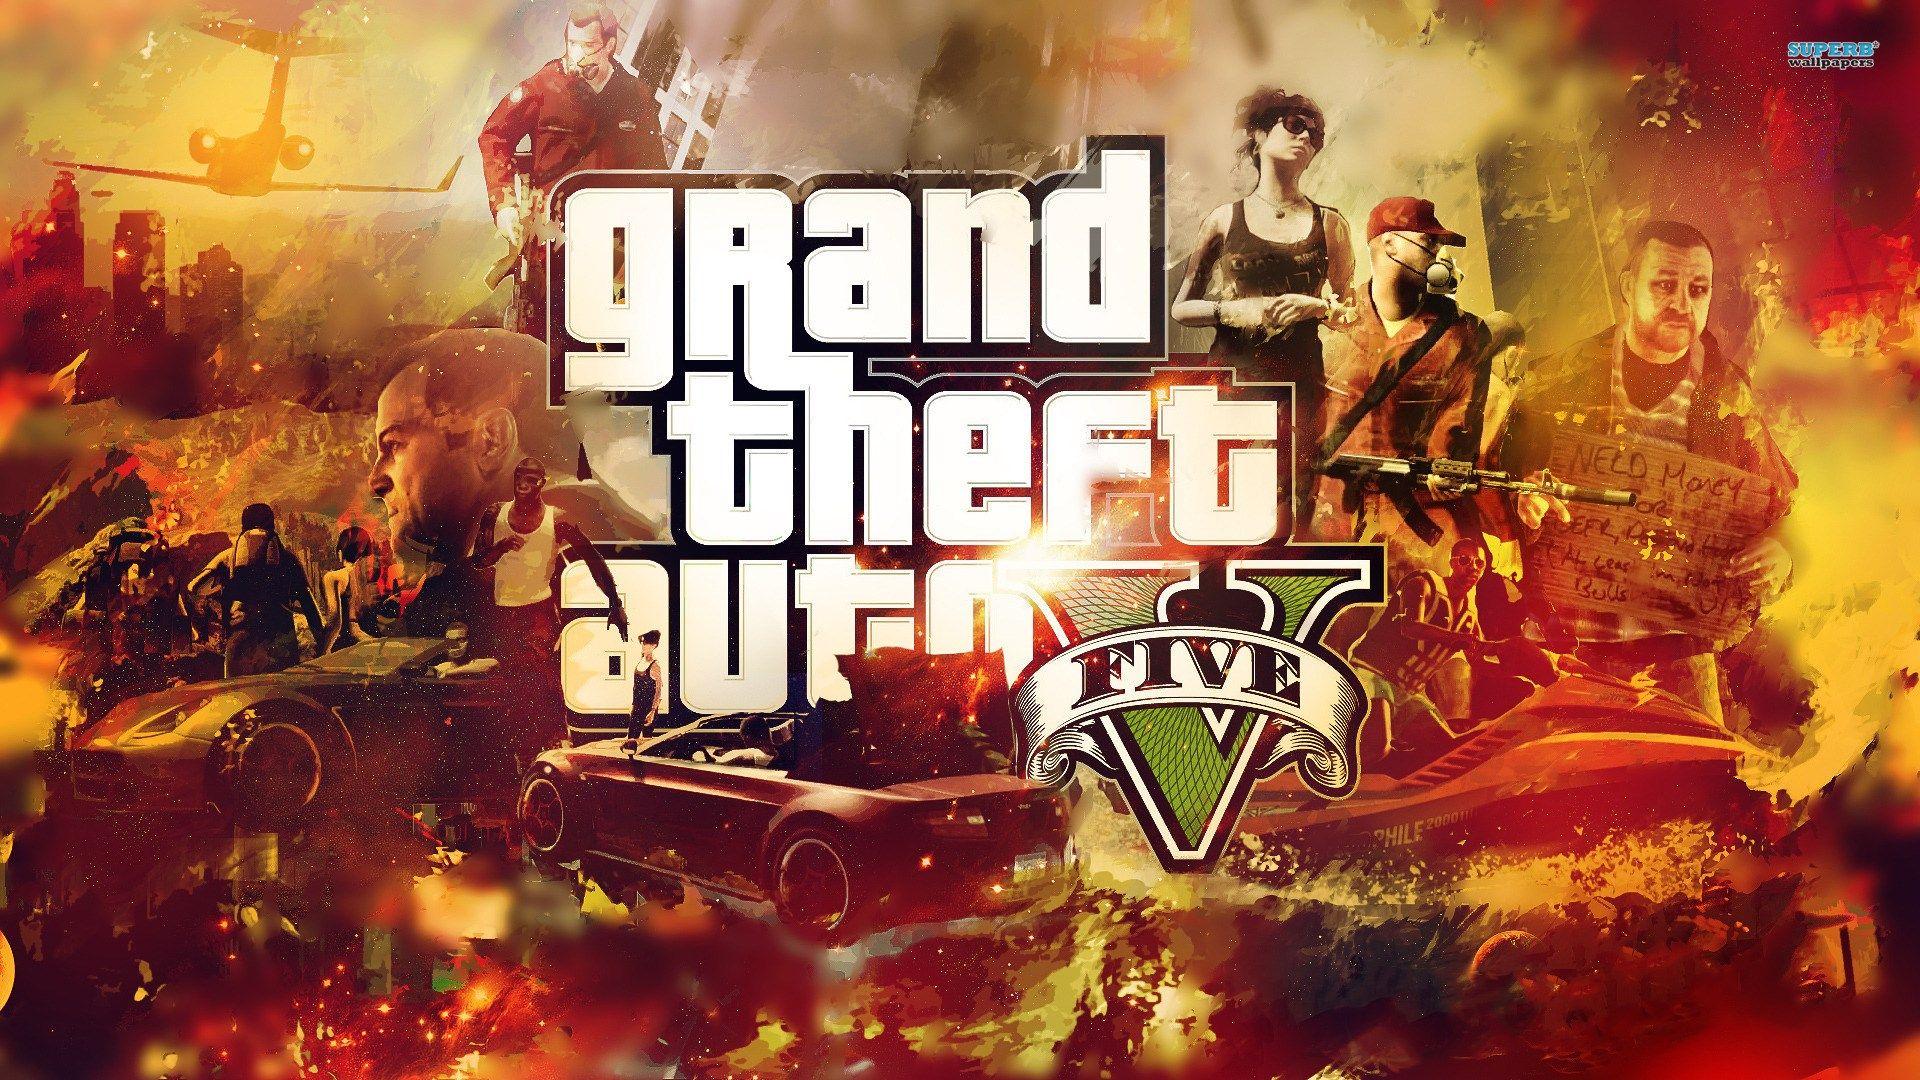 Free Desktop Backgrounds For Grand Theft Auto V 607 Kb Felton